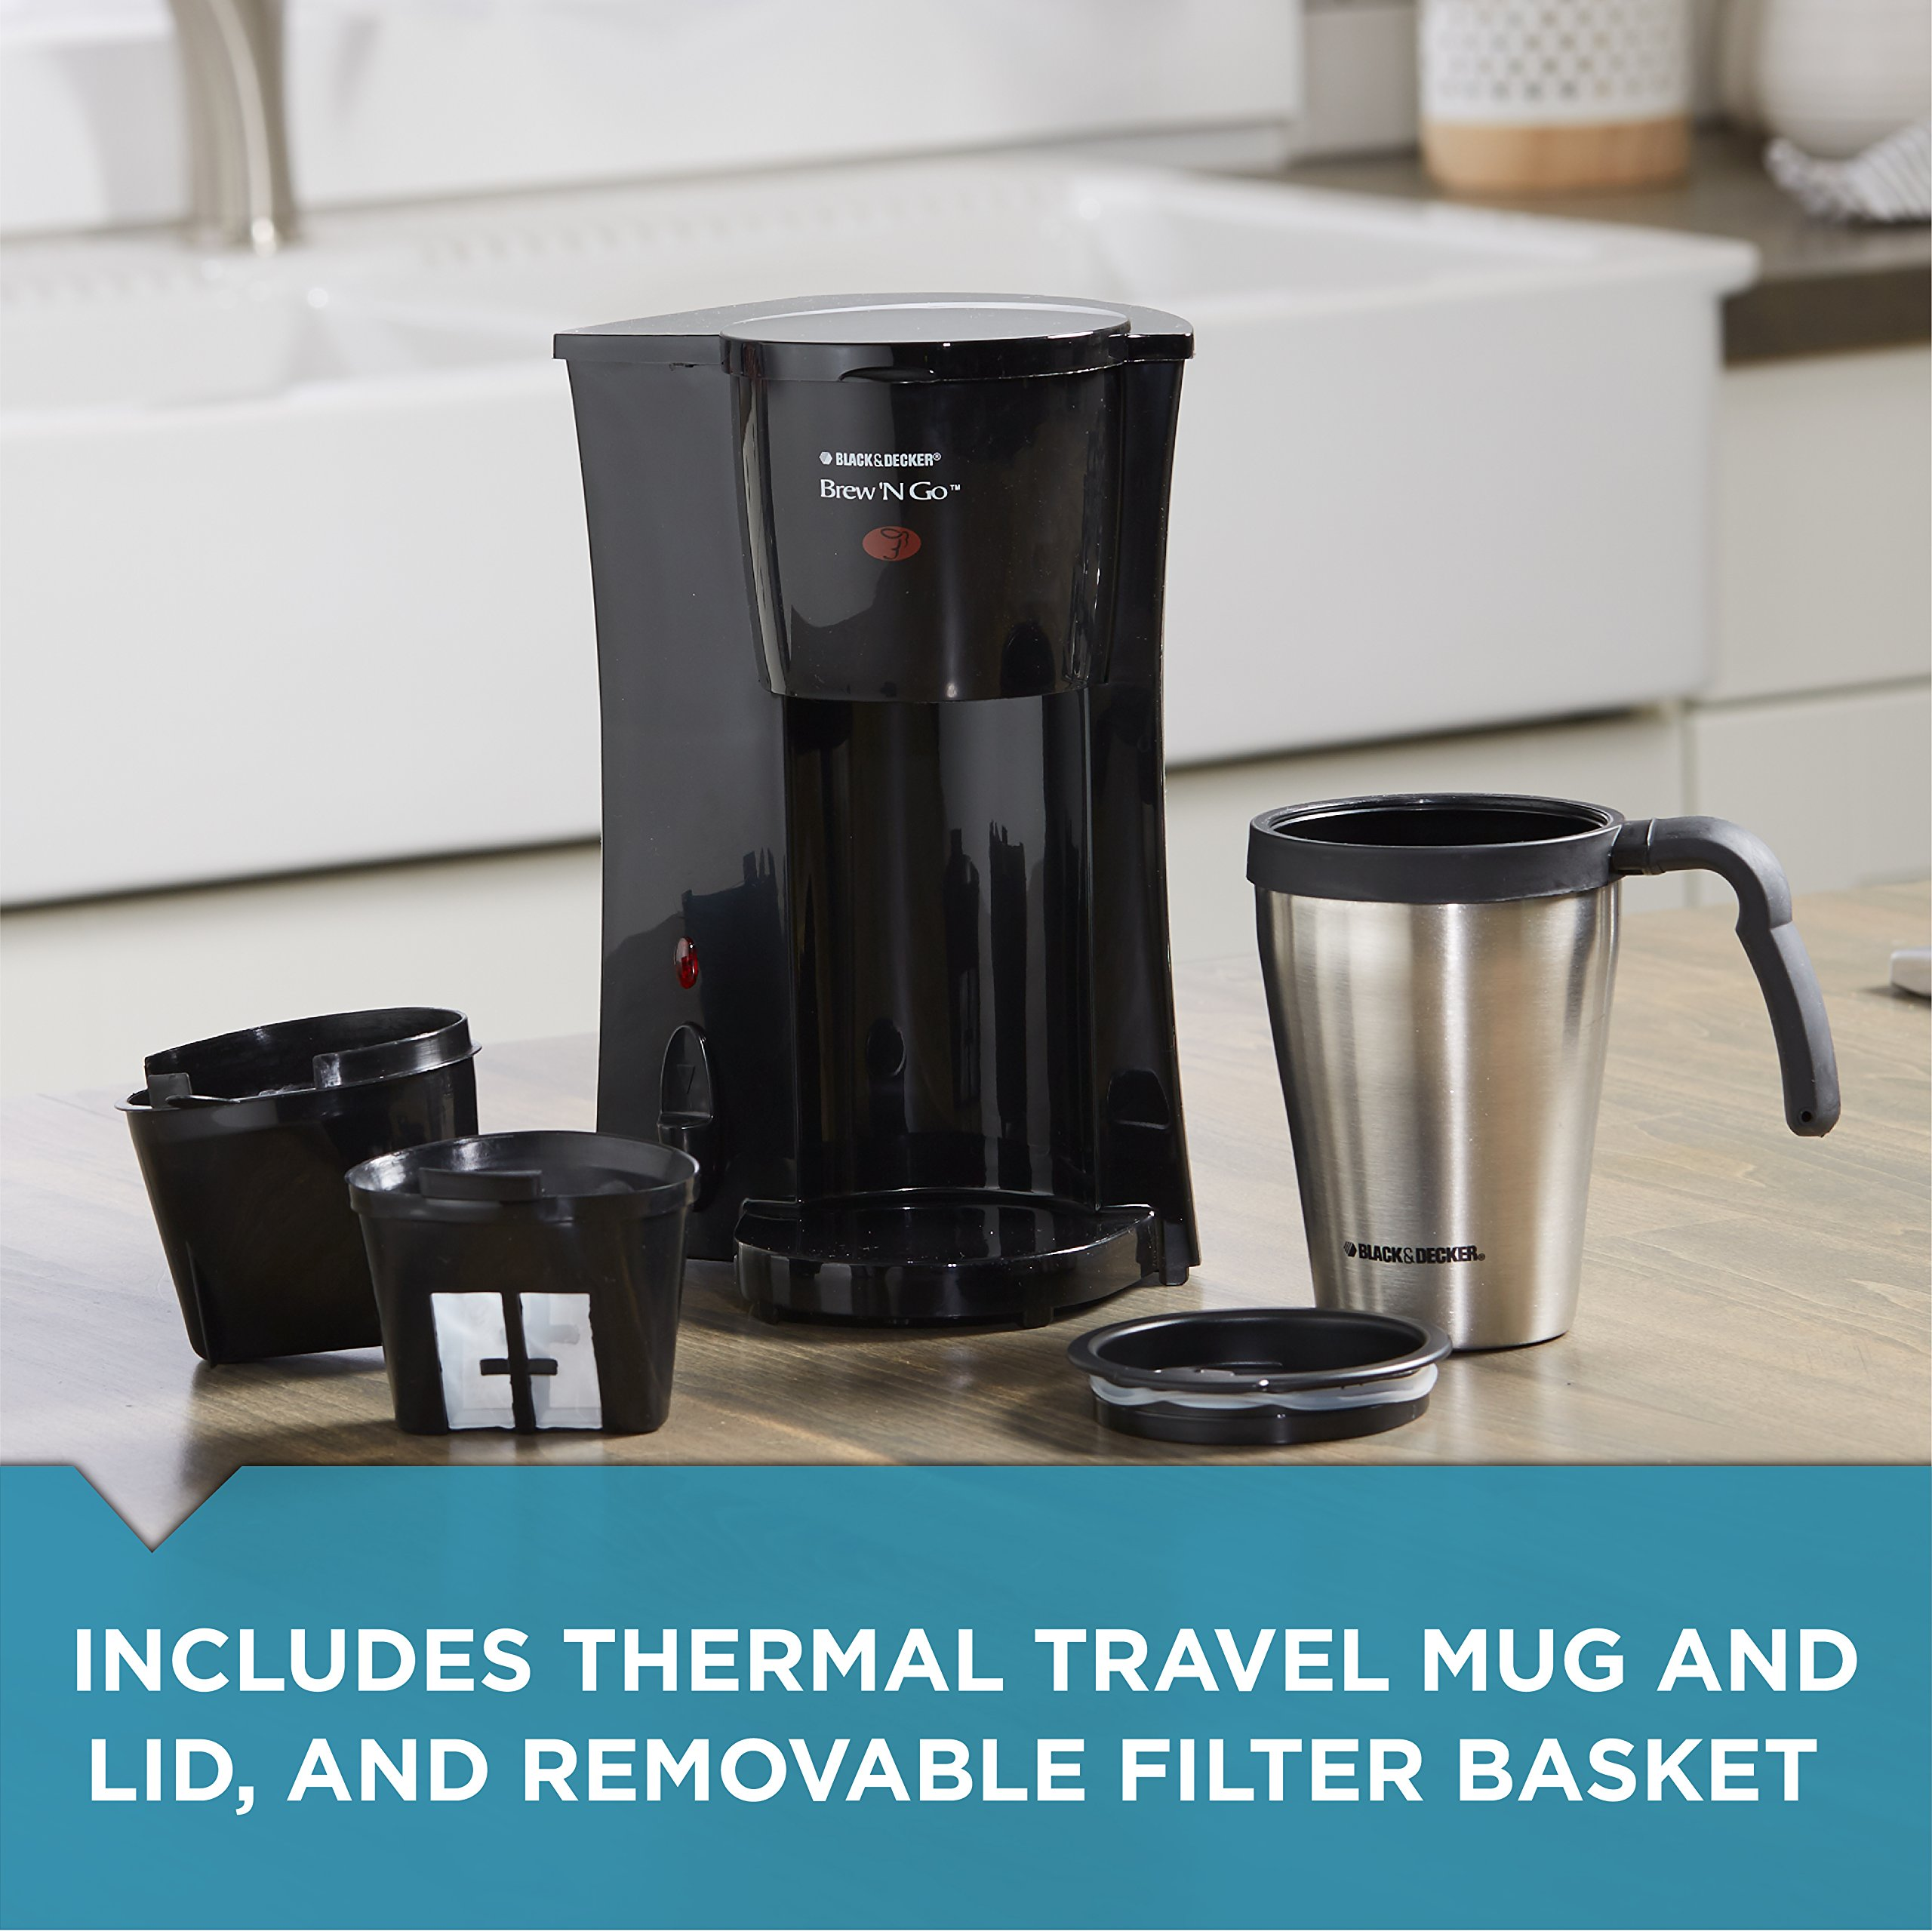 BLACK+DECKER DCM18S Brew 'n Go Personal Coffeemaker with Travel Mug, Black/Stainless Steel by Black & Decker (Image #5)